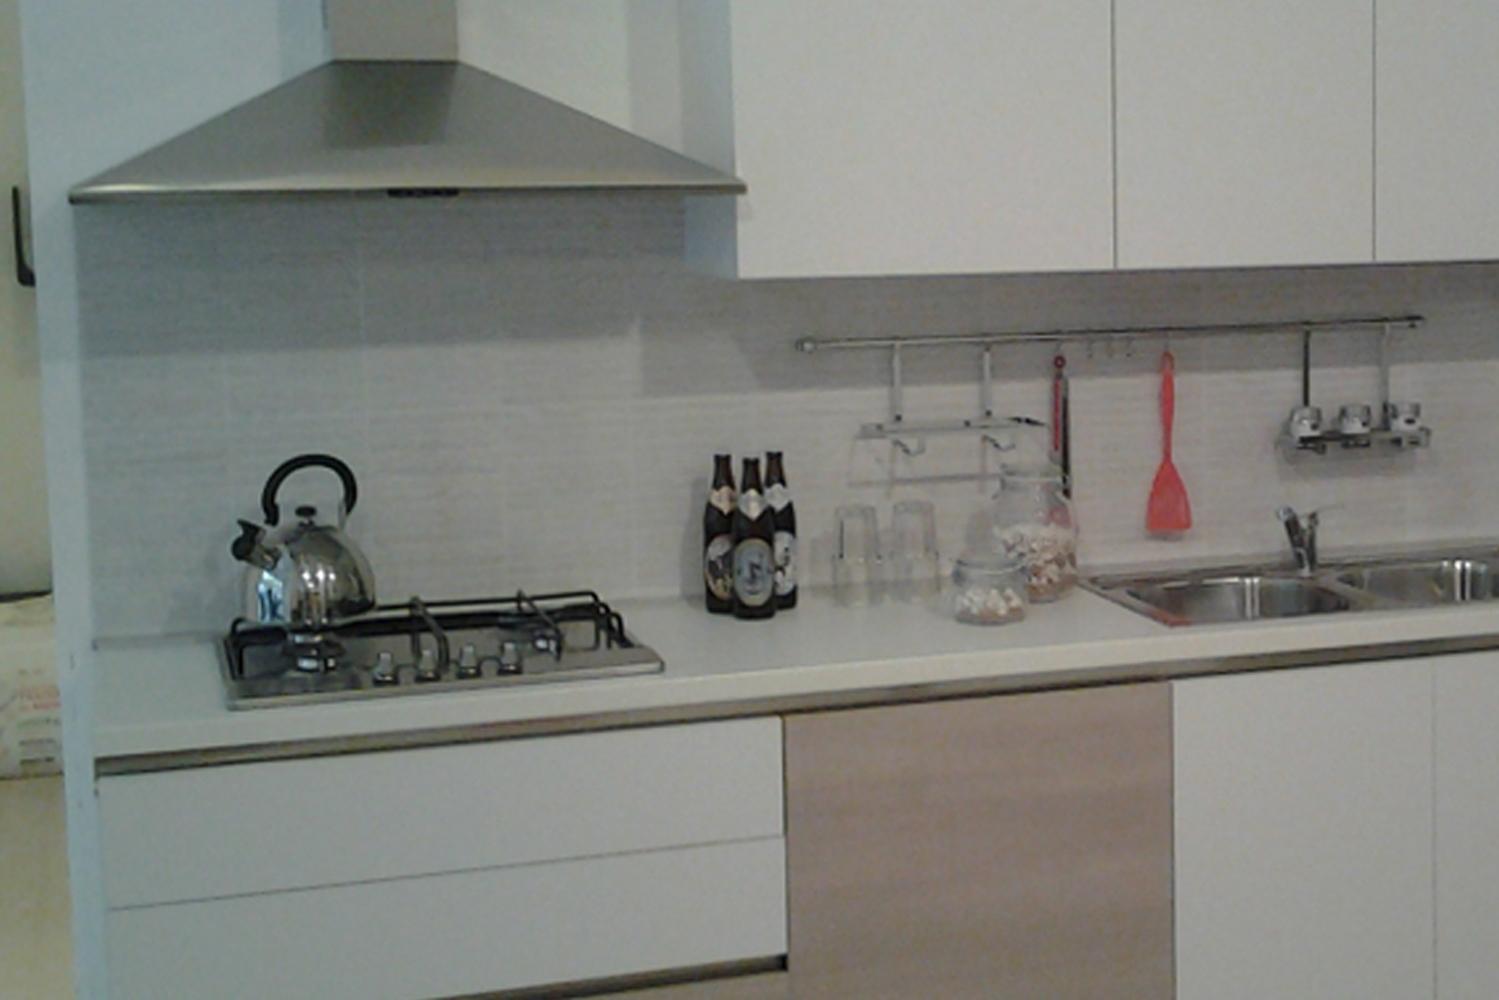 cucine in offerta sconto 58% a milano - Cucine a prezzi scontati